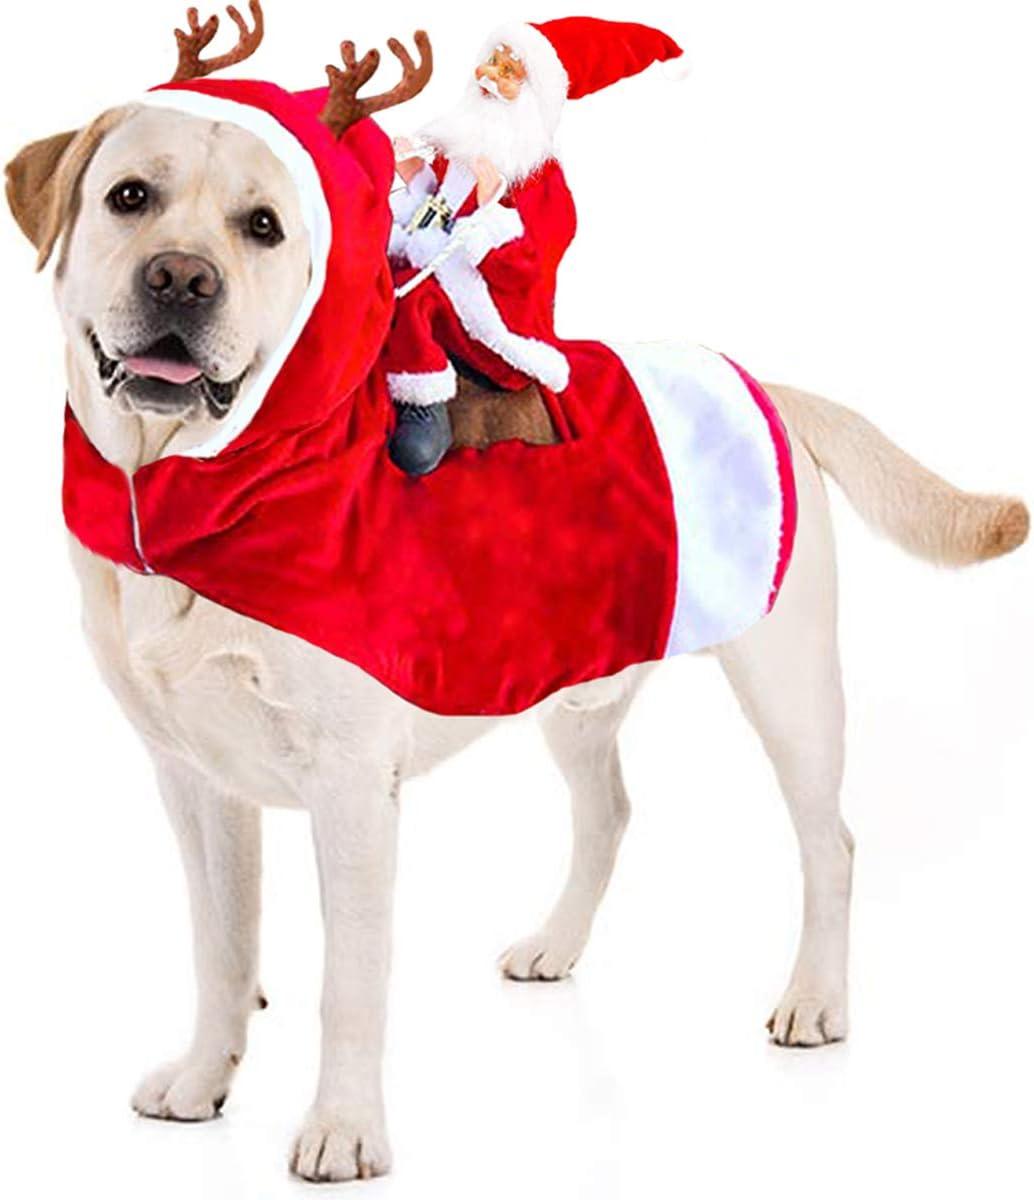 Kyerivs Dog Christmas Costume Dog Santa Claus Costume Dog Cat Christmas  Holiday Outfit Pet Christmas Clothes Running Santa Claus Riding on Pet for